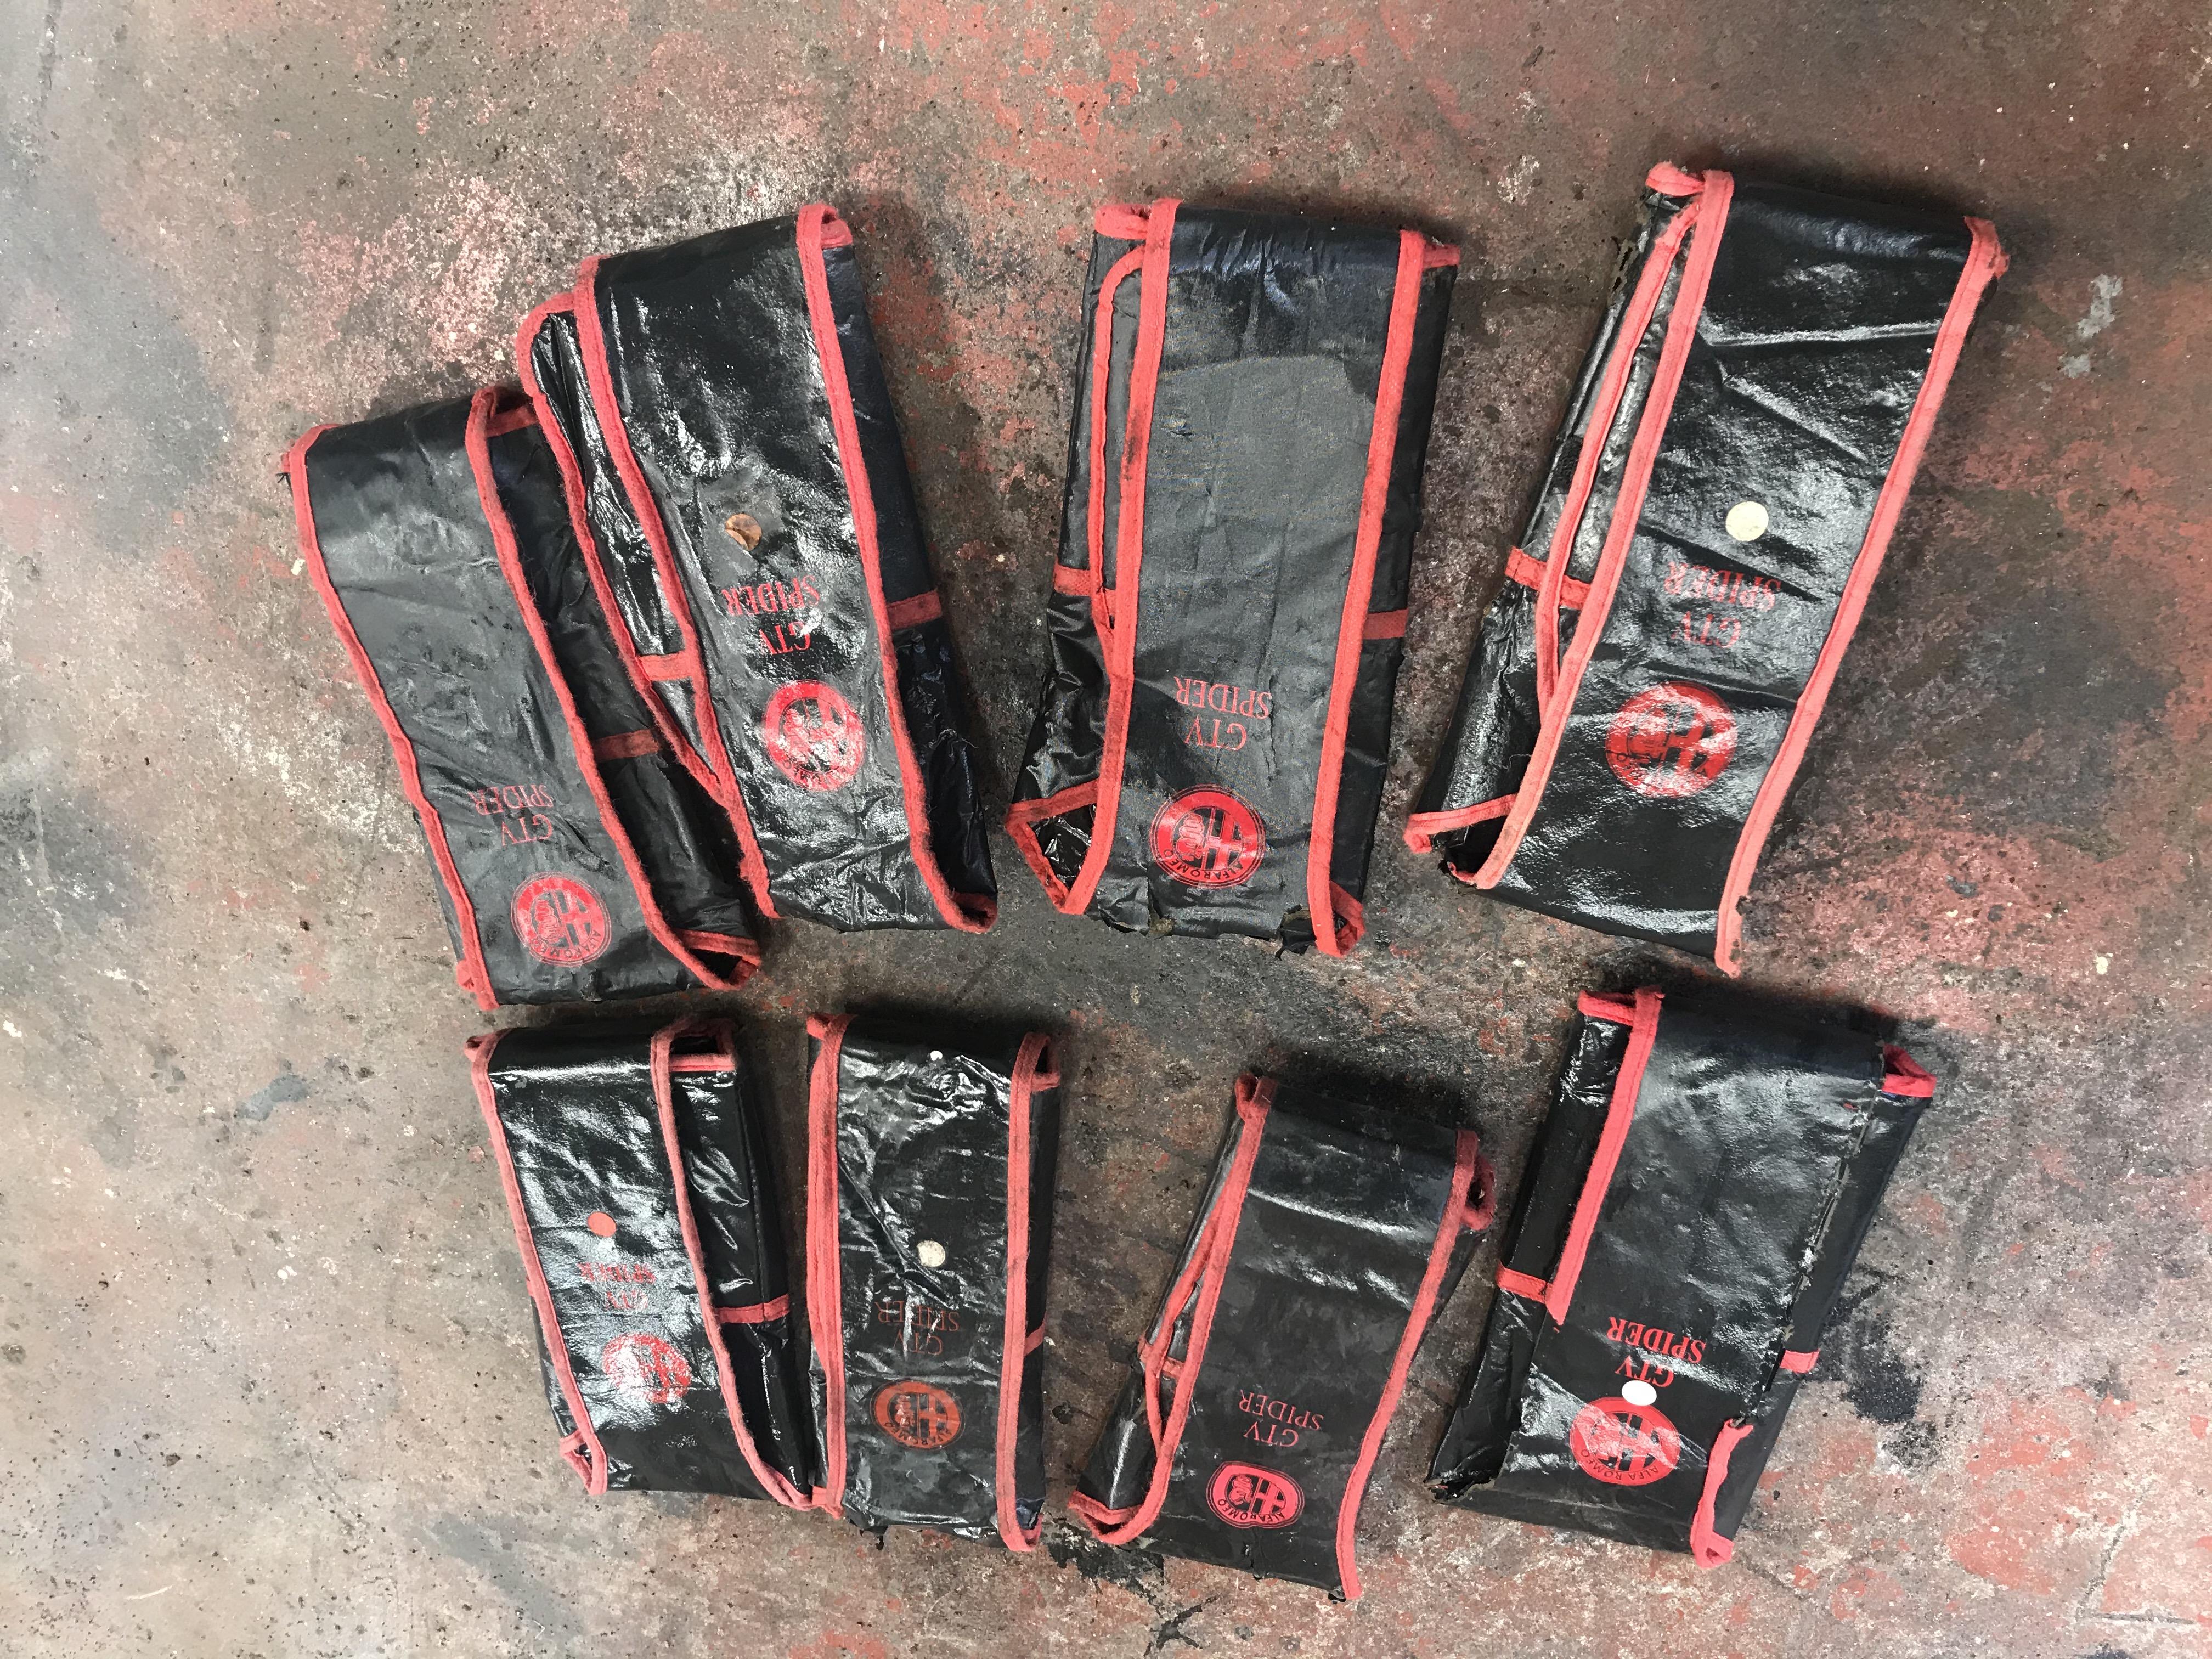 916 tool bag